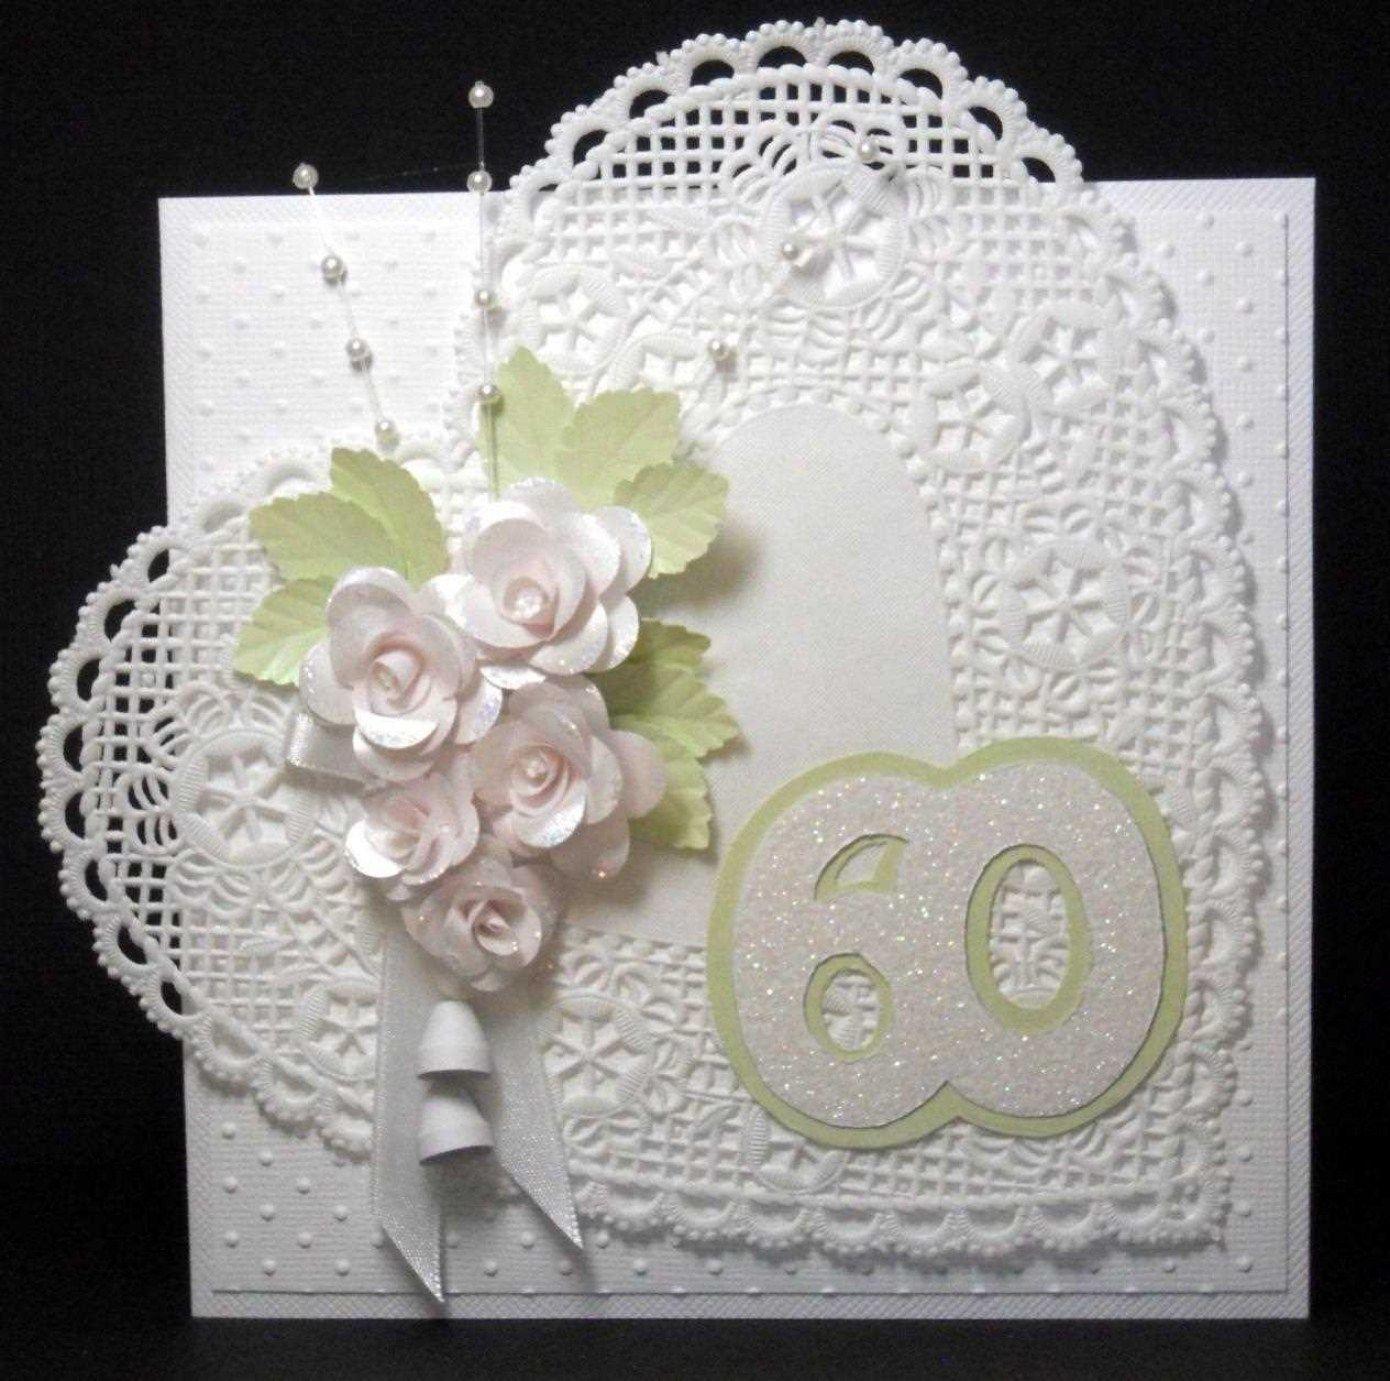 32 Stunning Diamond Wedding Party Decorations | Weddings